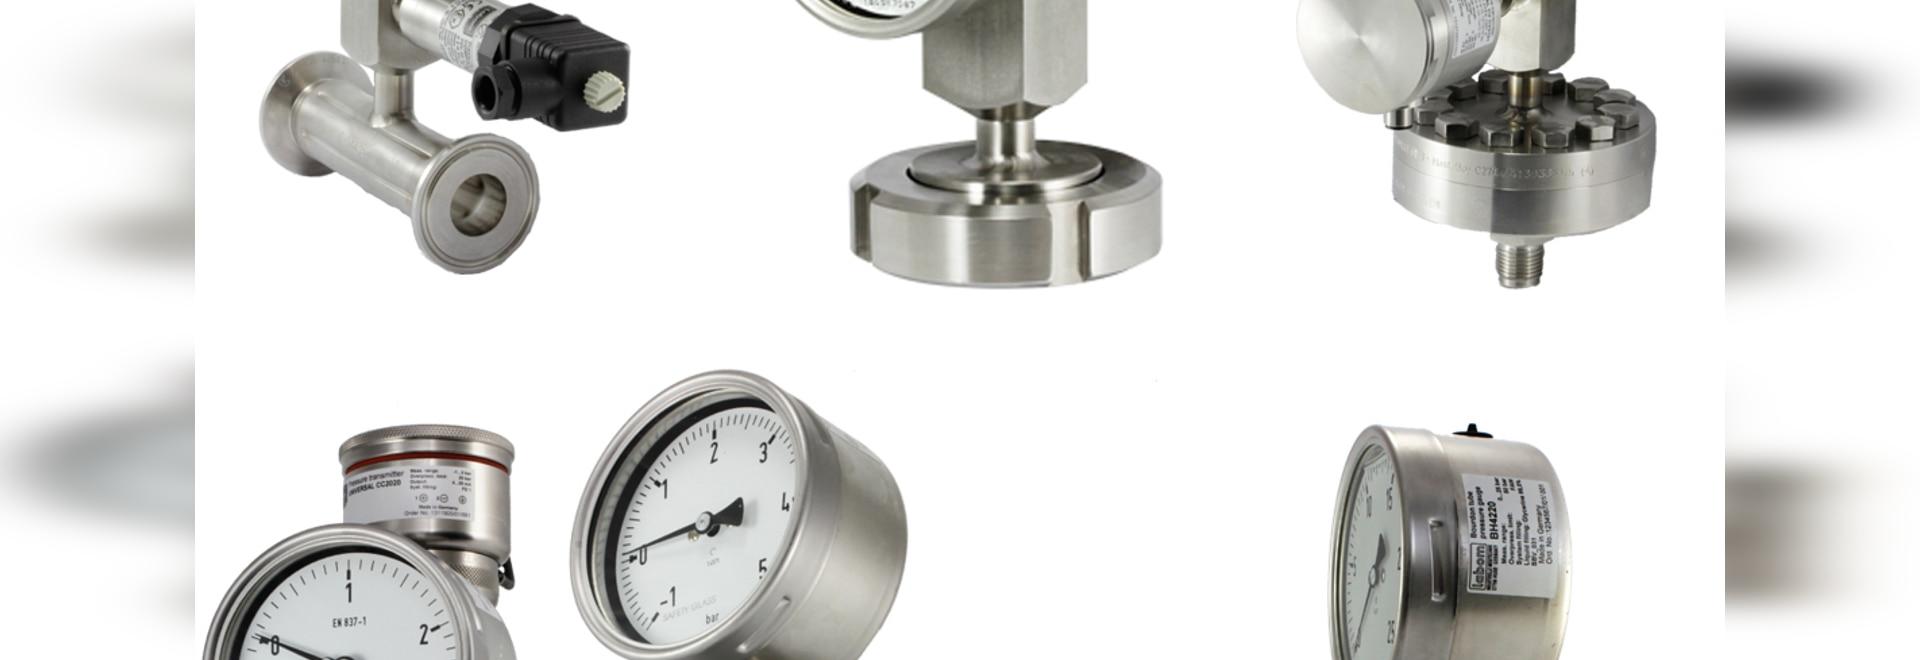 """Kombibar"" pressure measurement device"